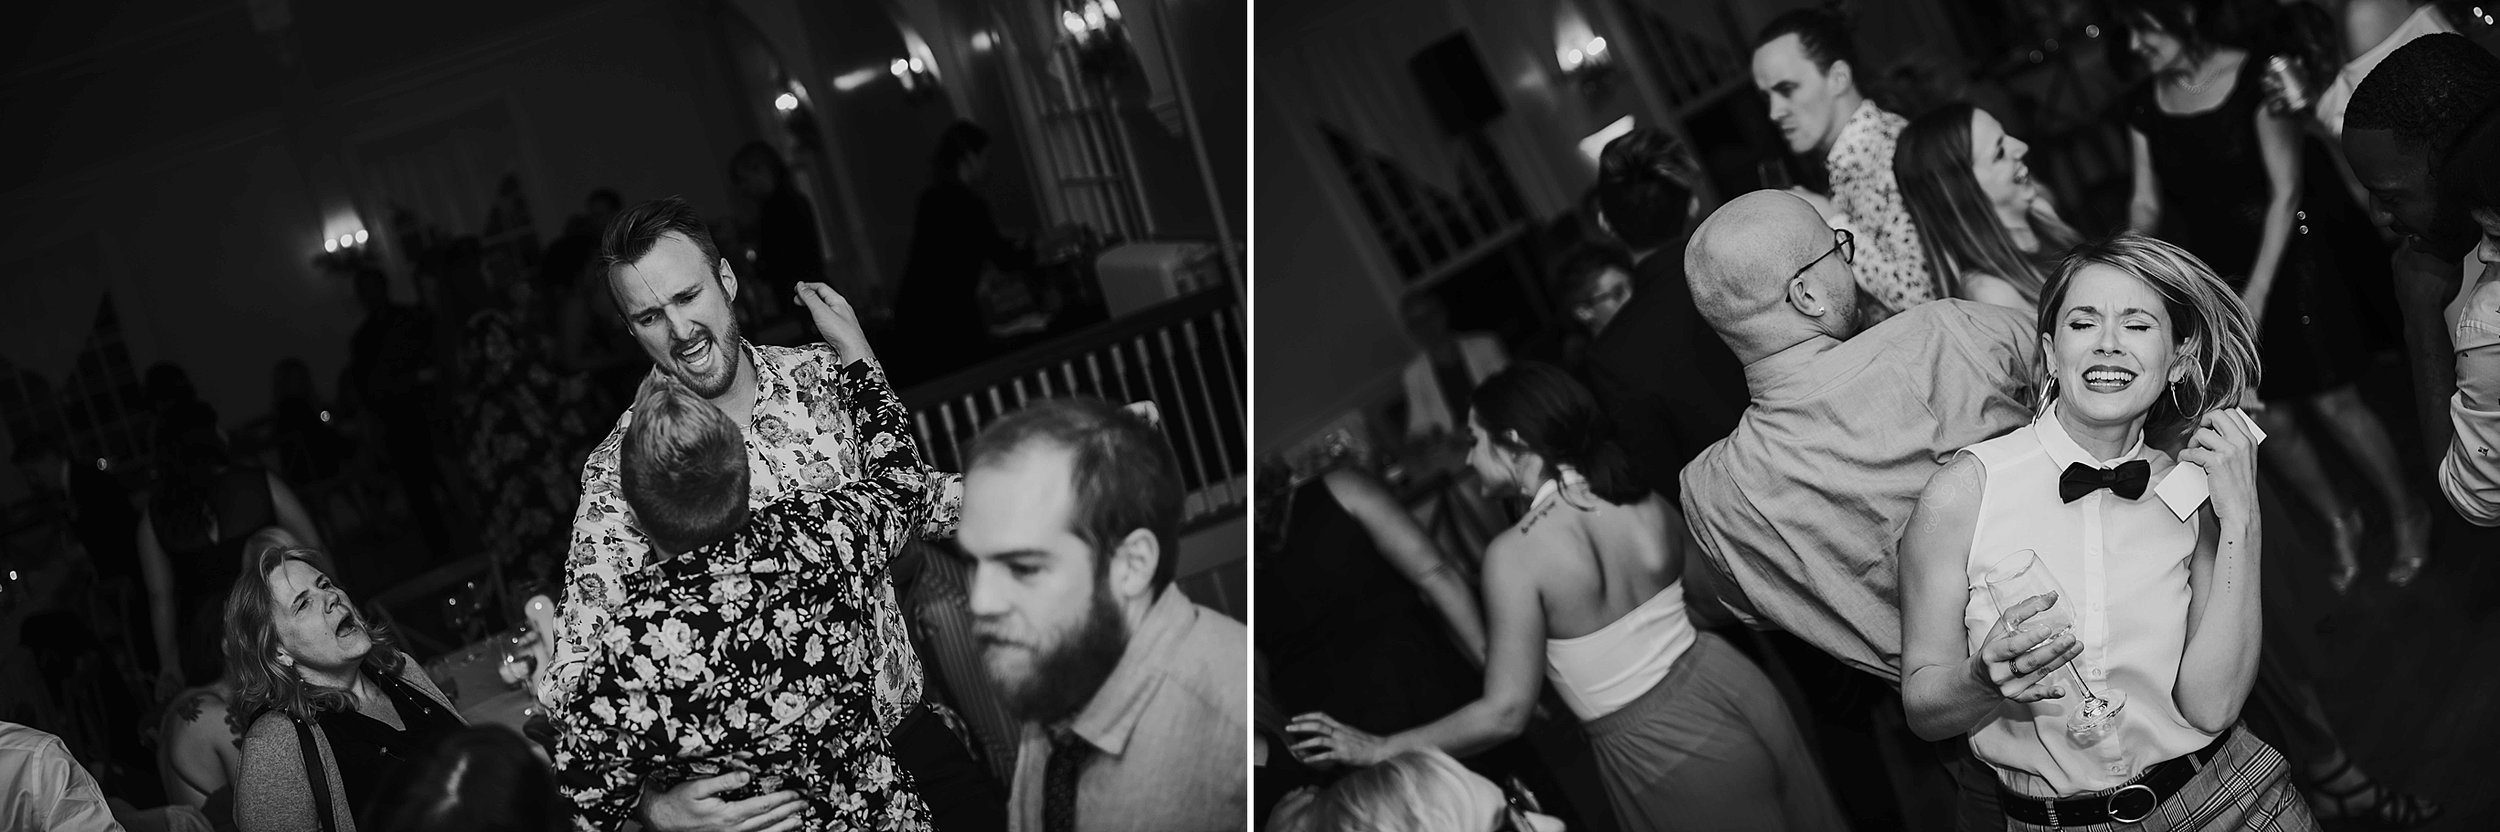 Seattle-Wedding-photographer-J HODGES PHOTOGRAPHY_0333.jpg